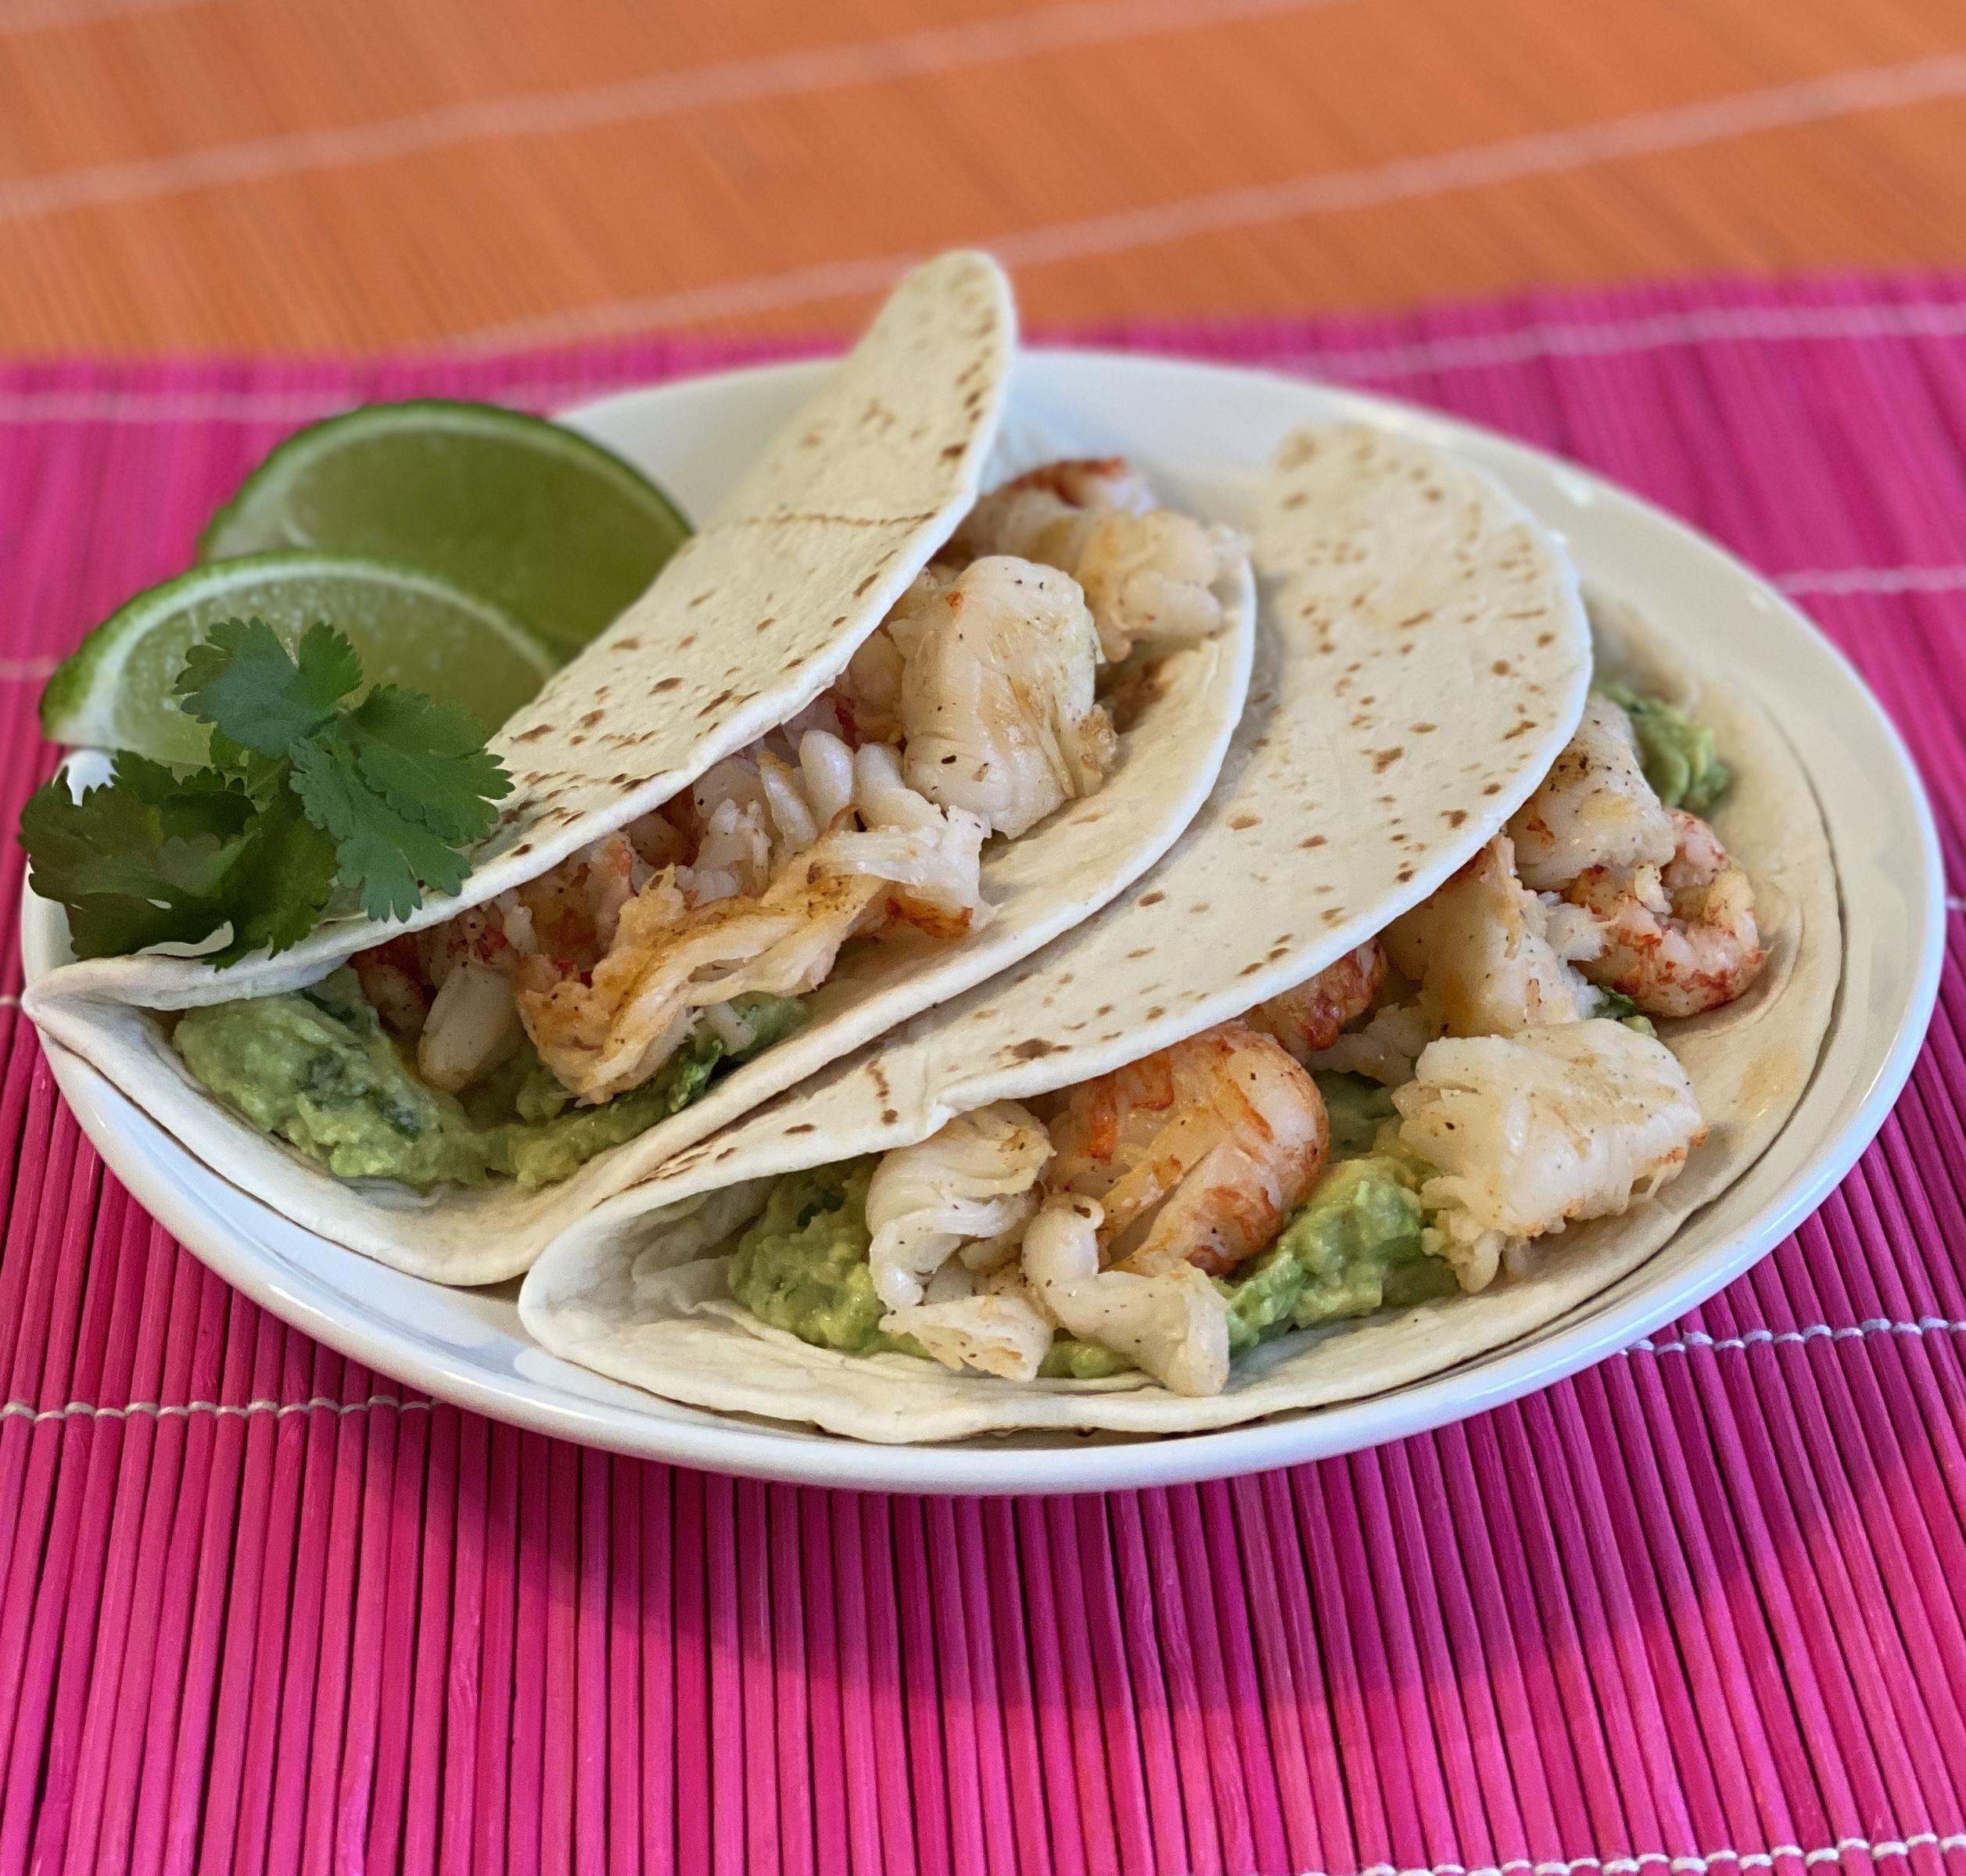 Baja Lobster Tacos